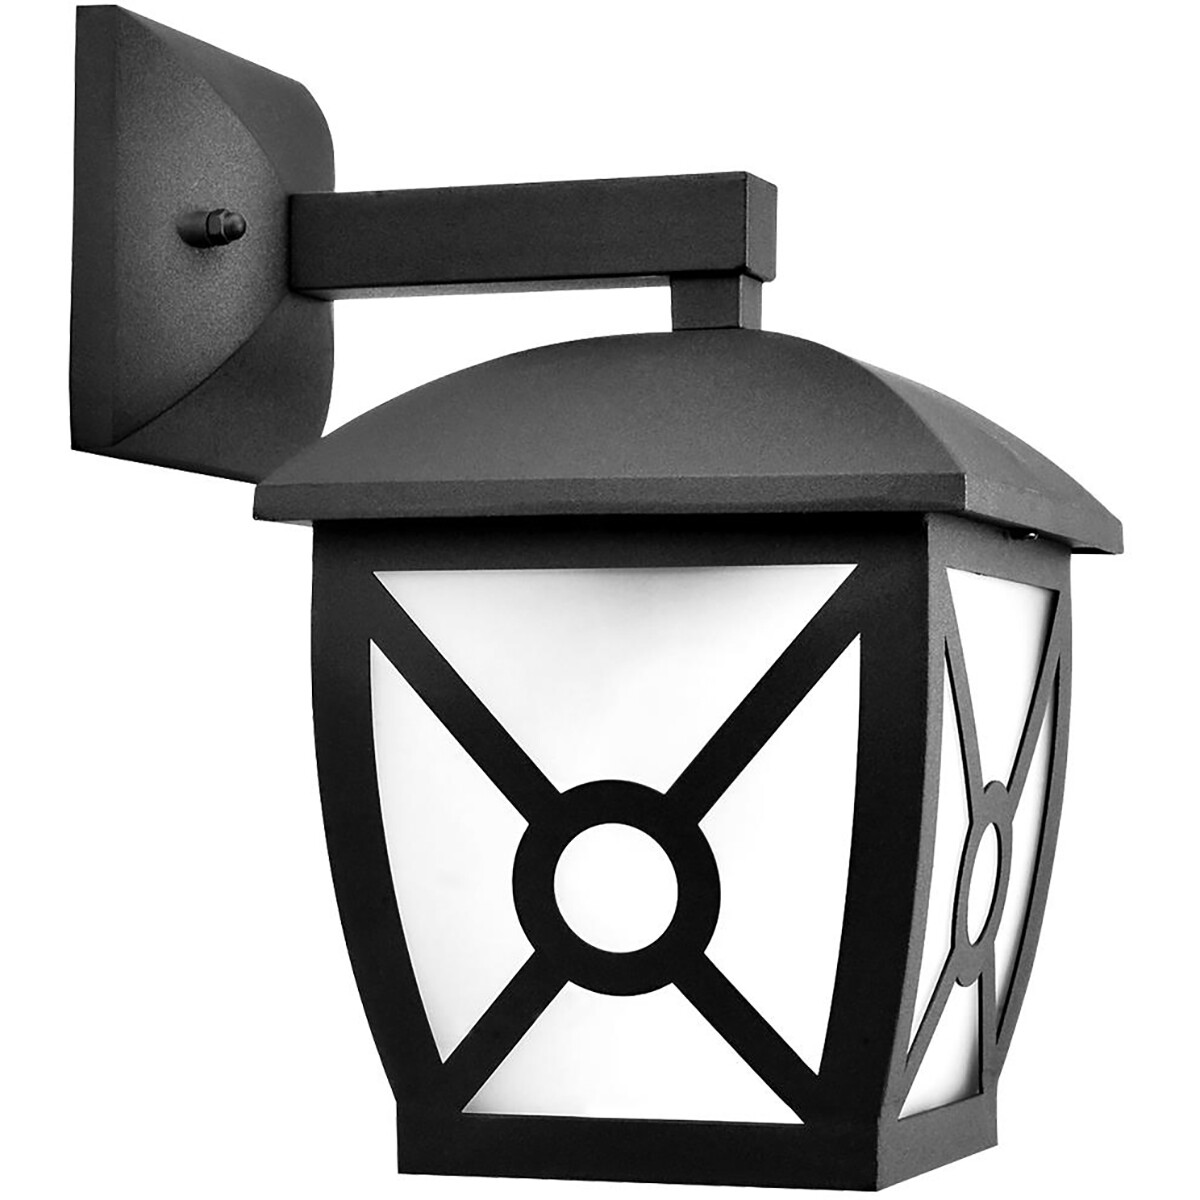 LED Tuinverlichting - Buitenlamp Nostalgisch - Aigi Nasto Down - E27 Fitting - Mat Zwart - Aluminium